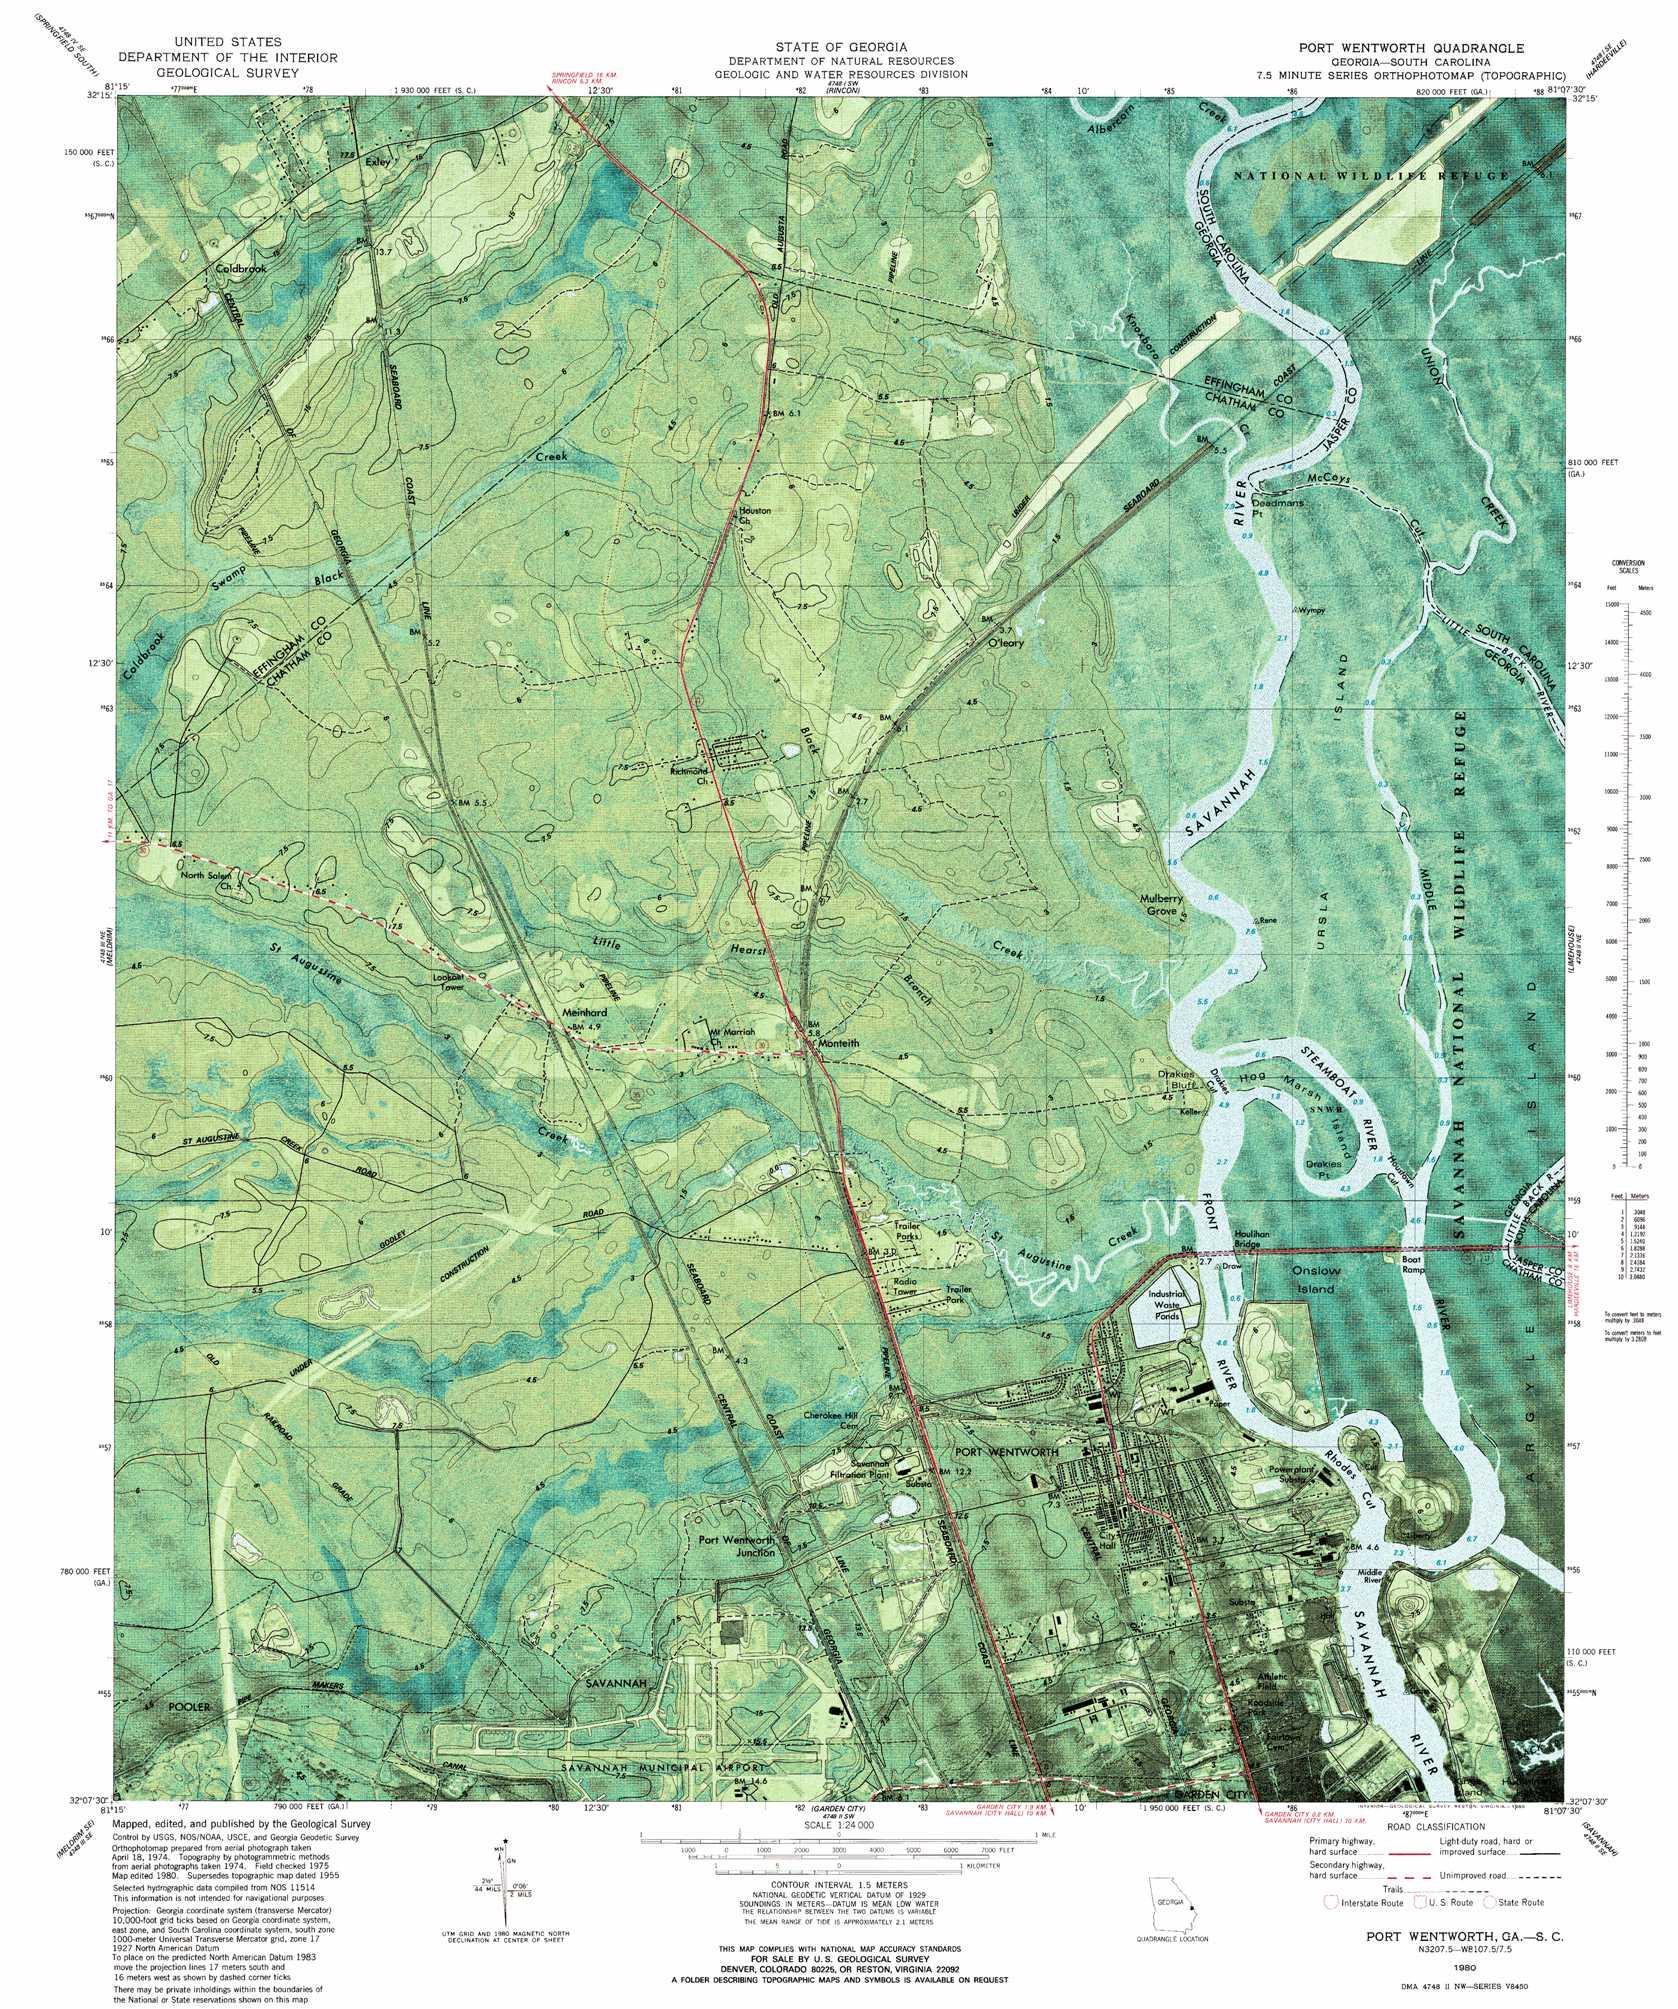 Port wentworth topographic map ga sc usgs topo quad for Port wentworth